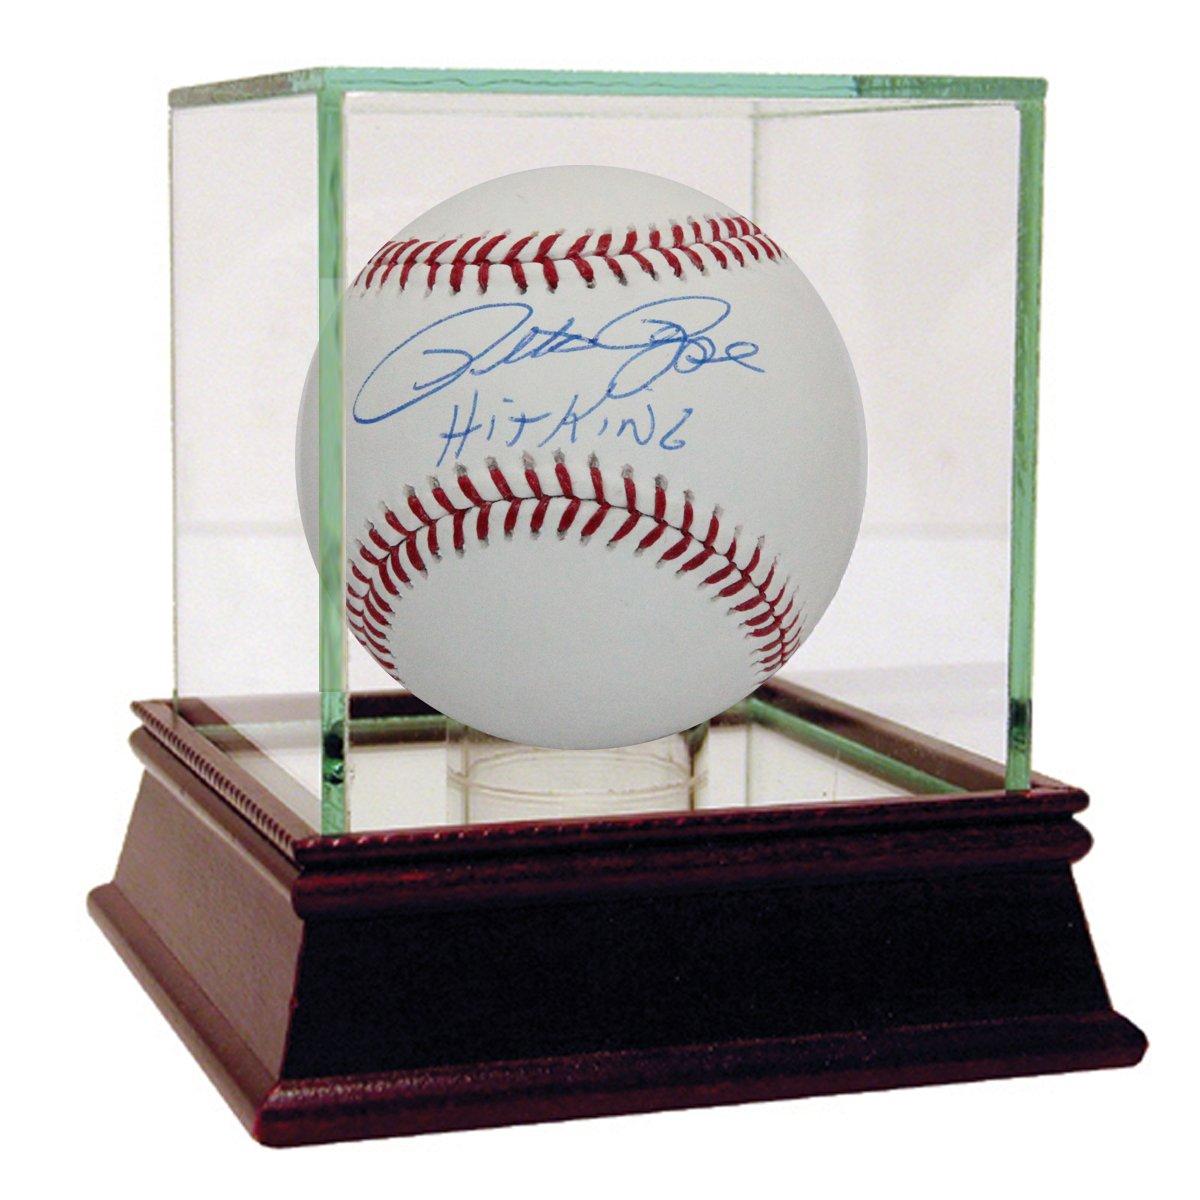 MLB Cincinnati Reds Pete Rose Signed Baseball with Hit King Inscription Steiner Sports ROSEBAS000007